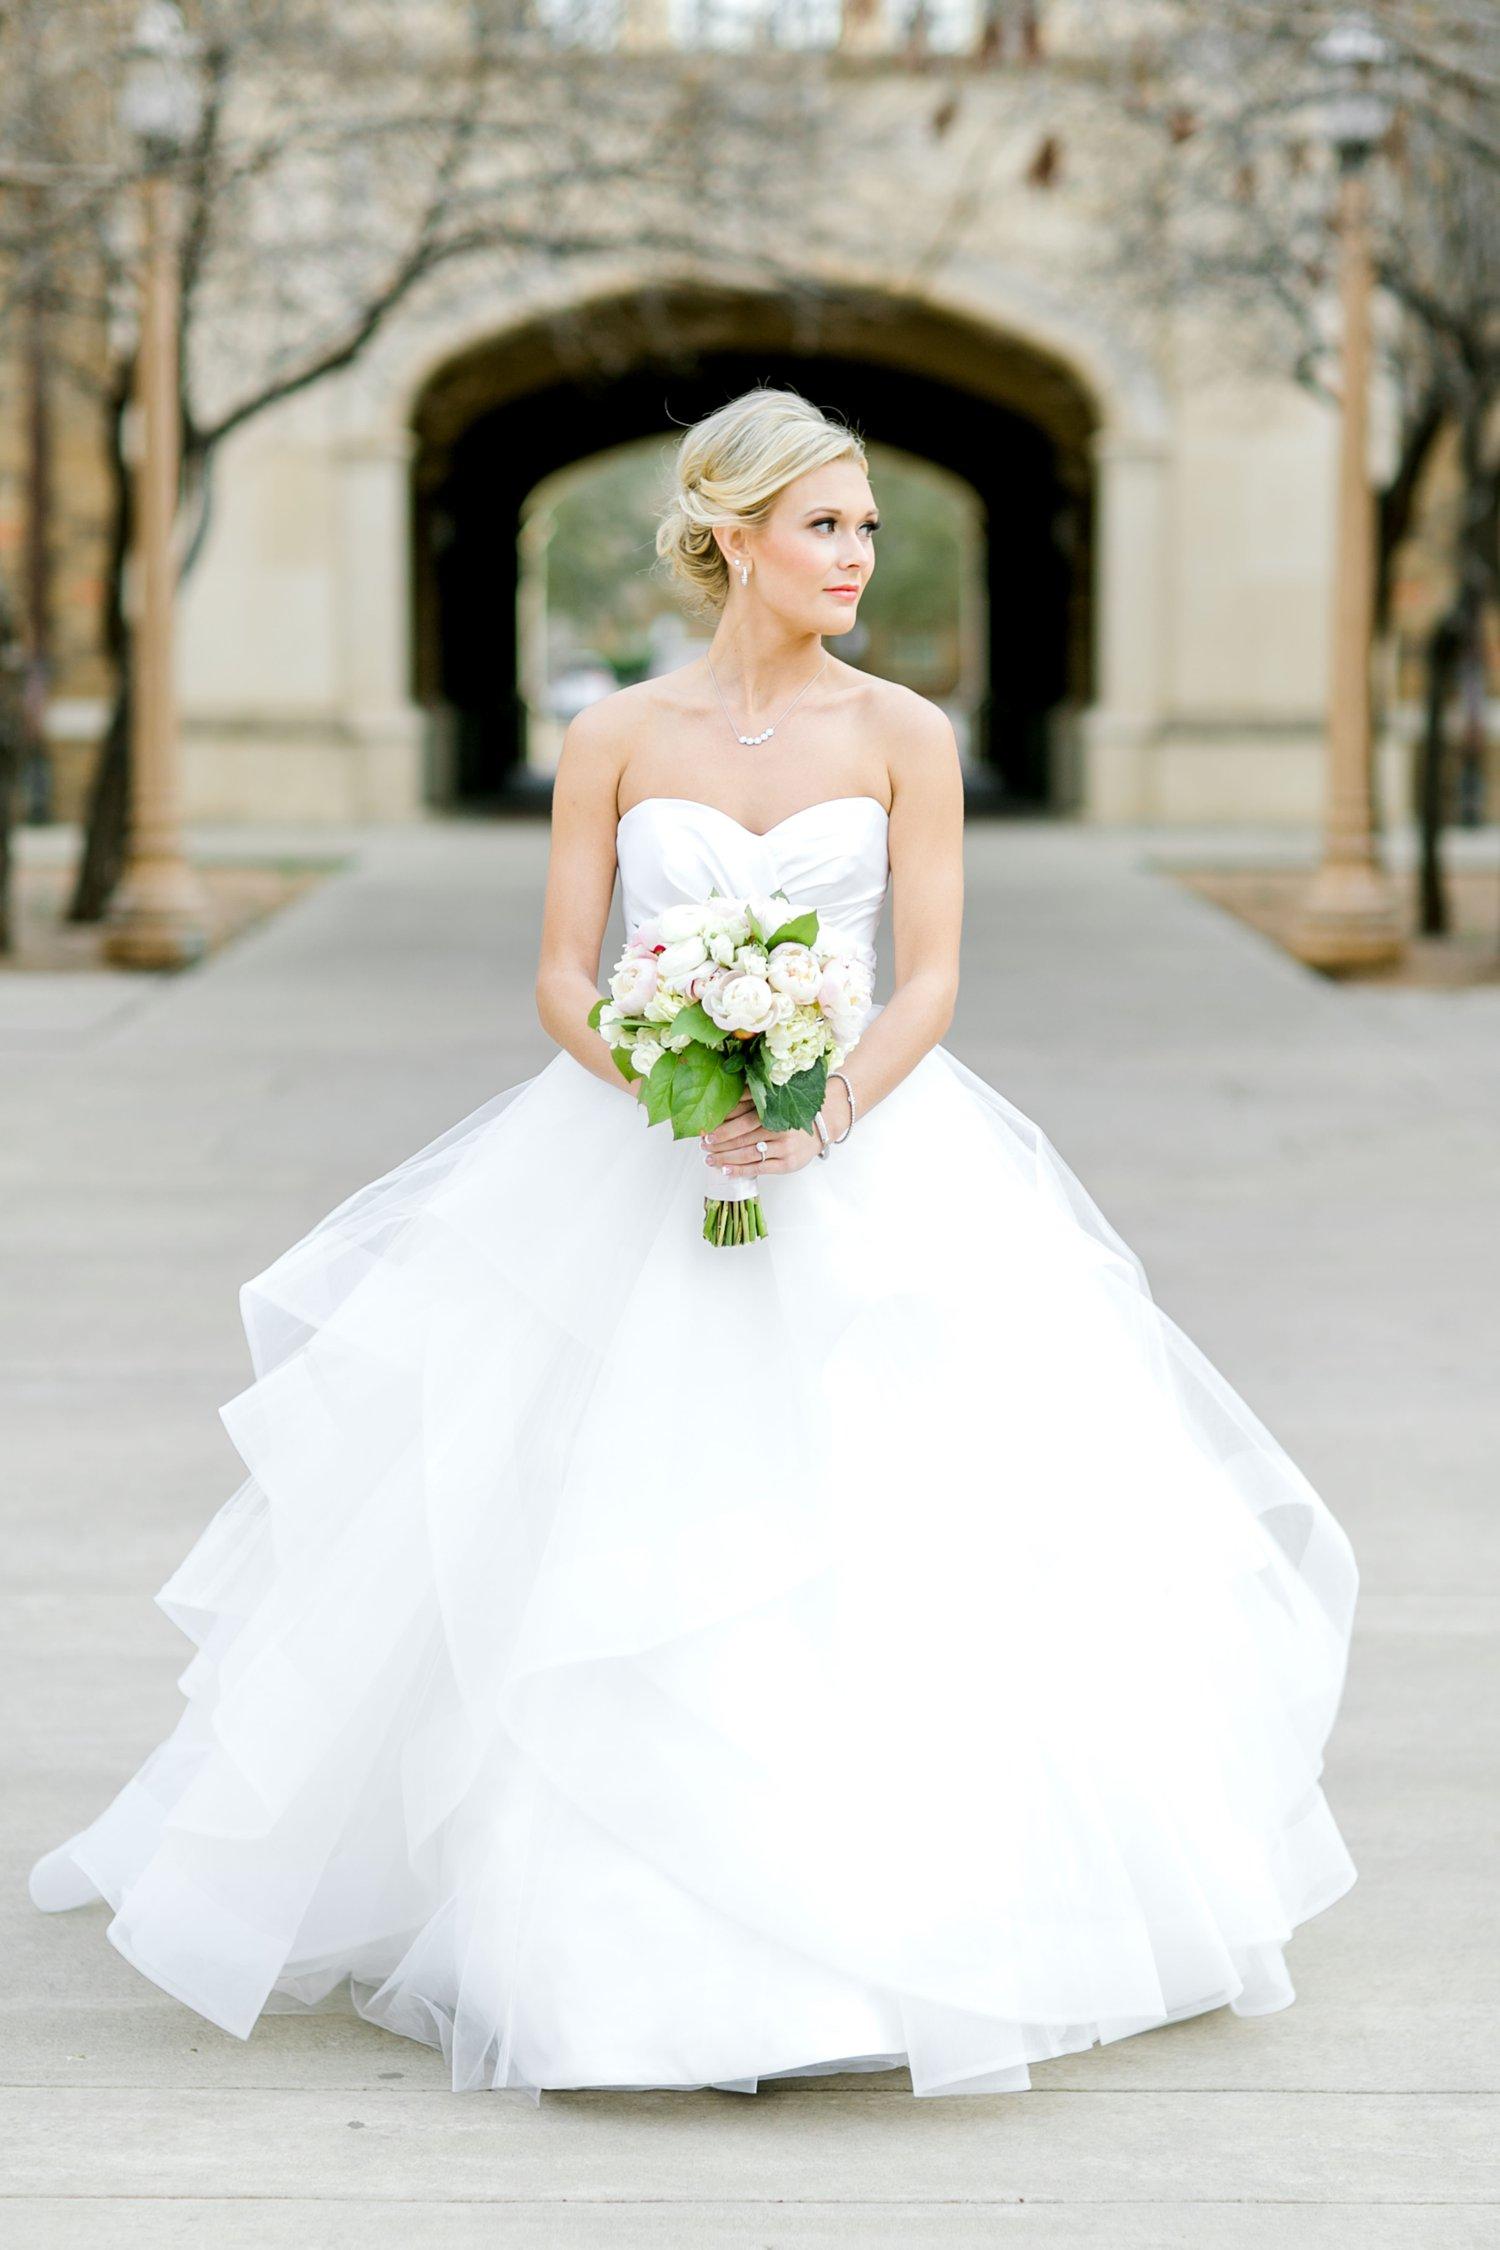 Taylor-Williams-Merket-Alumni-Center-Texas-Tech-Weddings-Lubbock-Photographer_0039.jpg